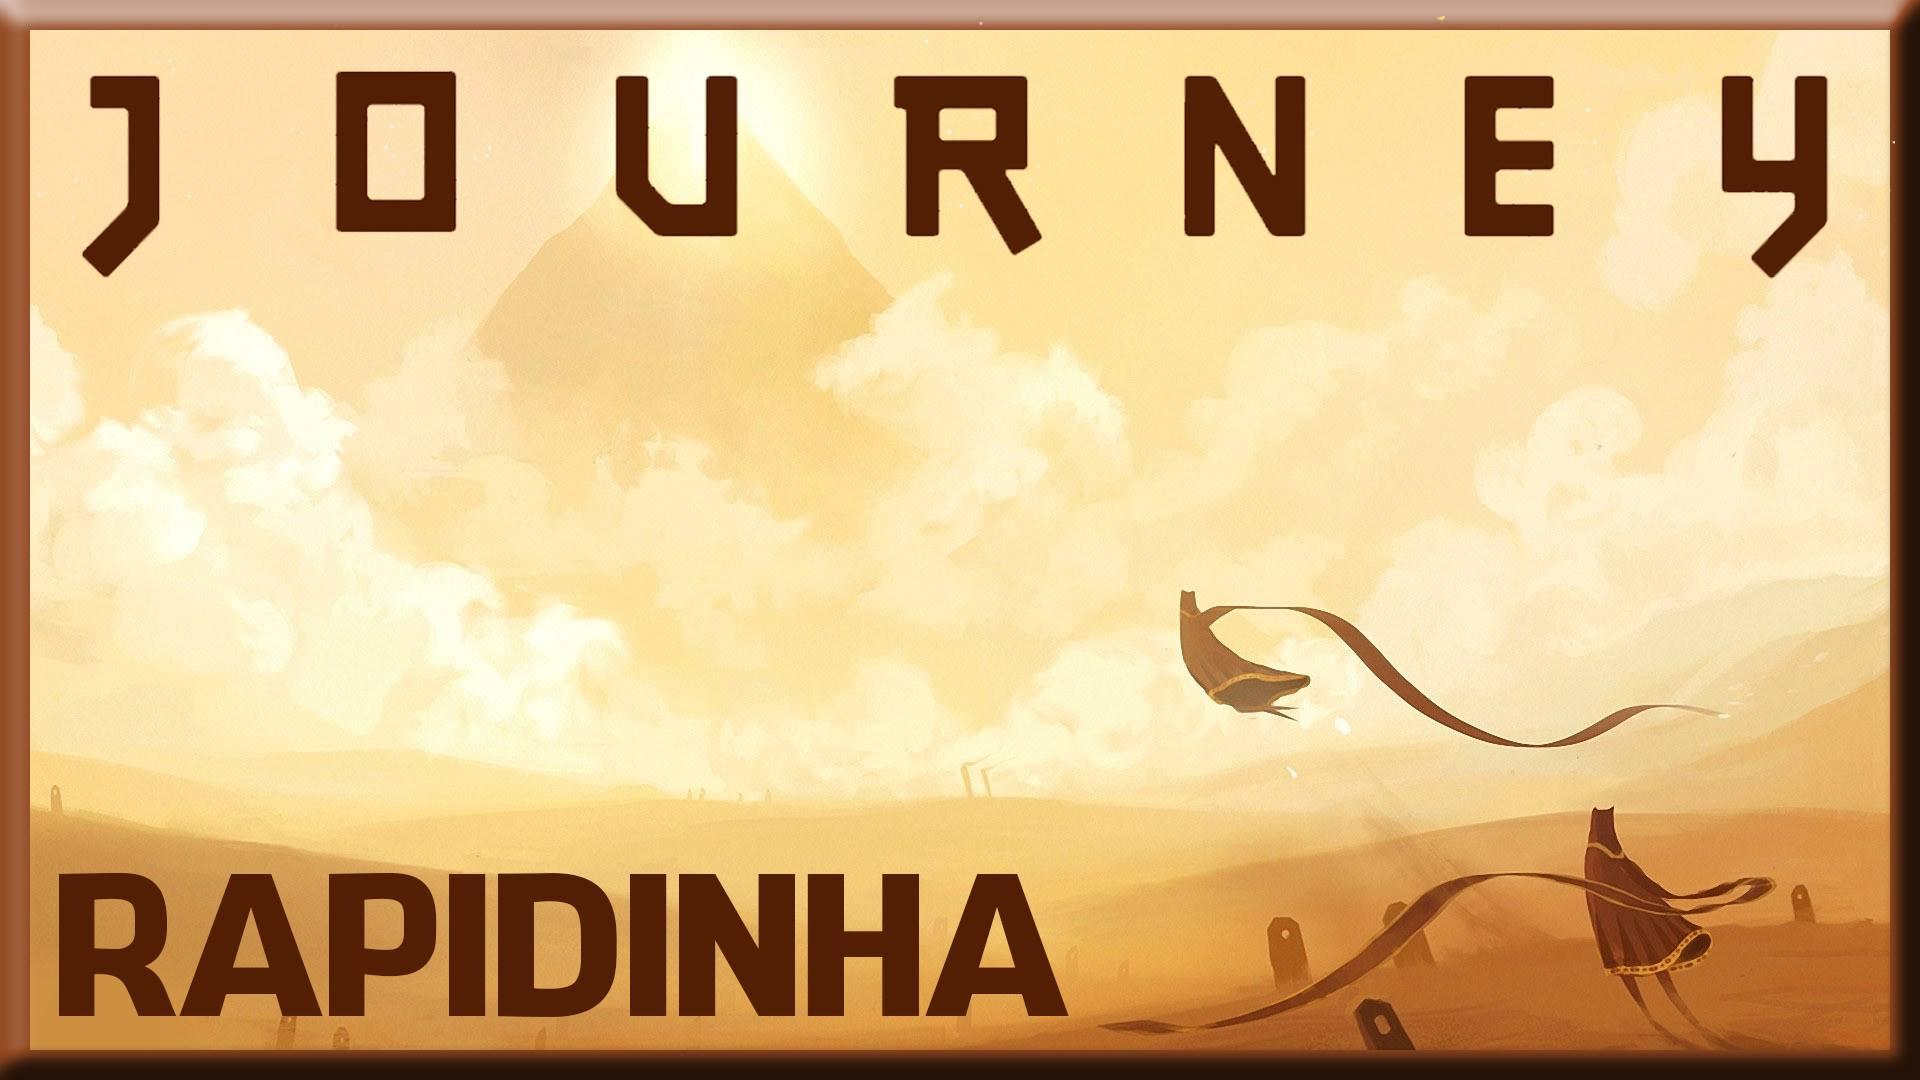 Journey - FHard - Rapidinha